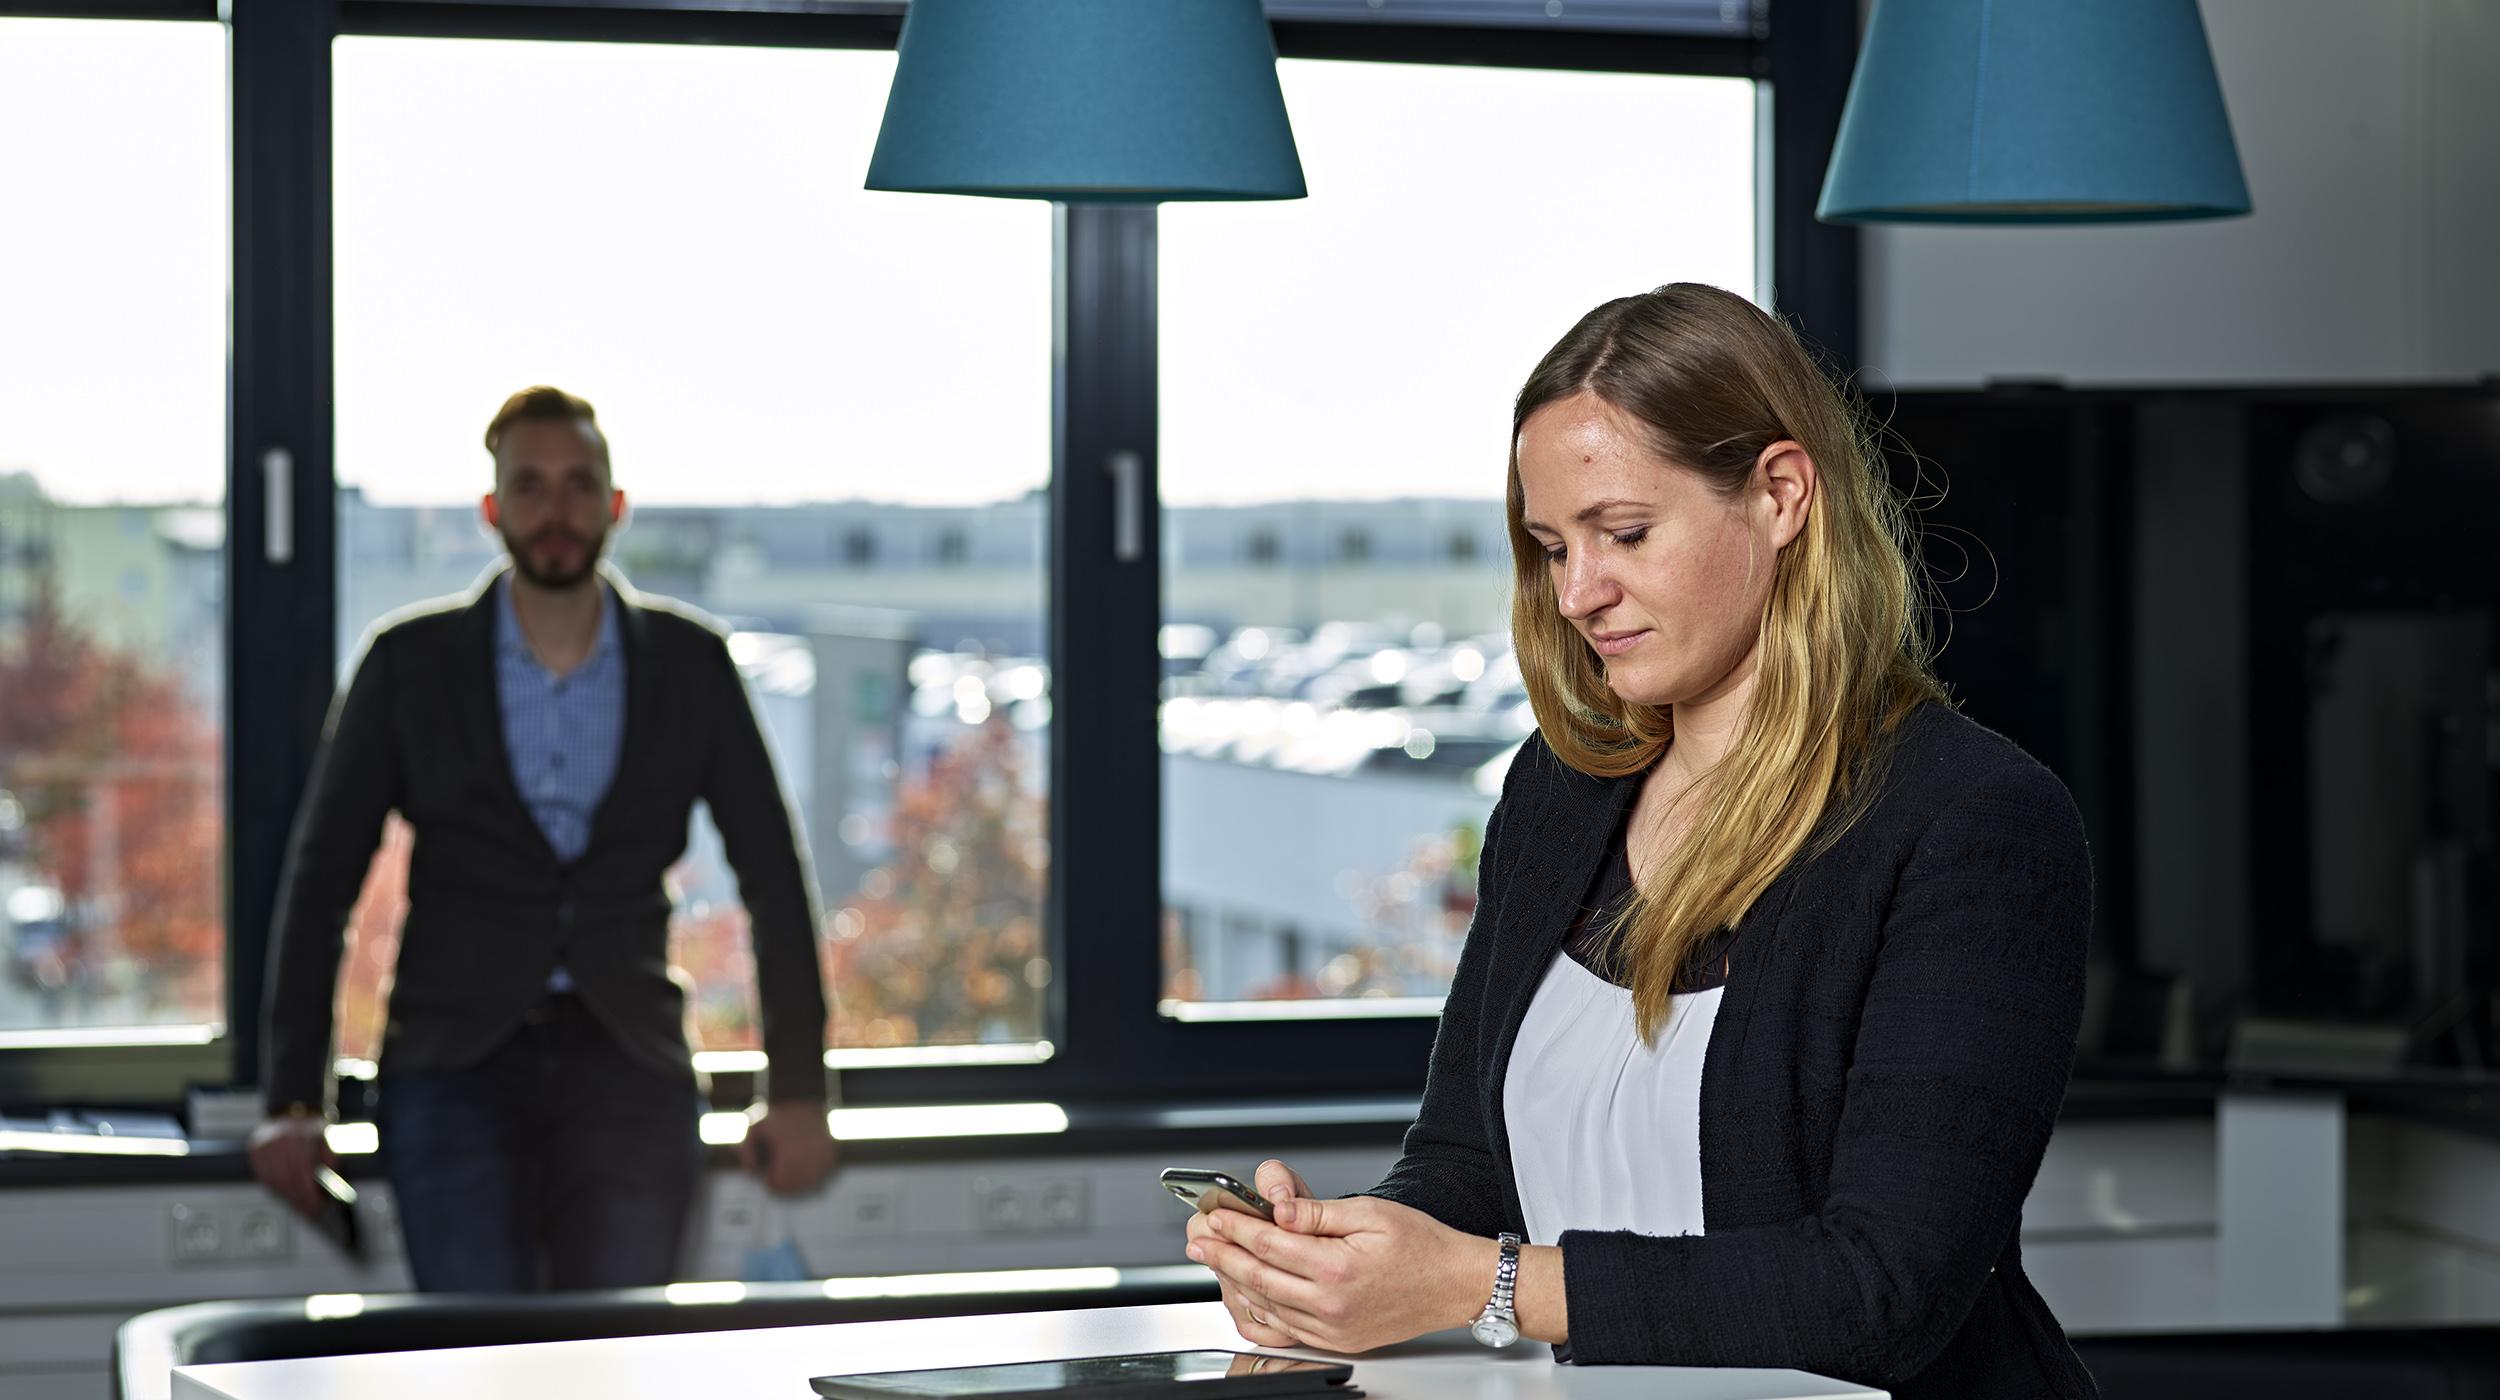 Corporate Fotograf, Unternehmensfotograf, Business Fotograf, Hamburg, Lübeck, Bremen, Hannover, Kiel, Stuttgart, Lüneburg, Schwerin, Rostock